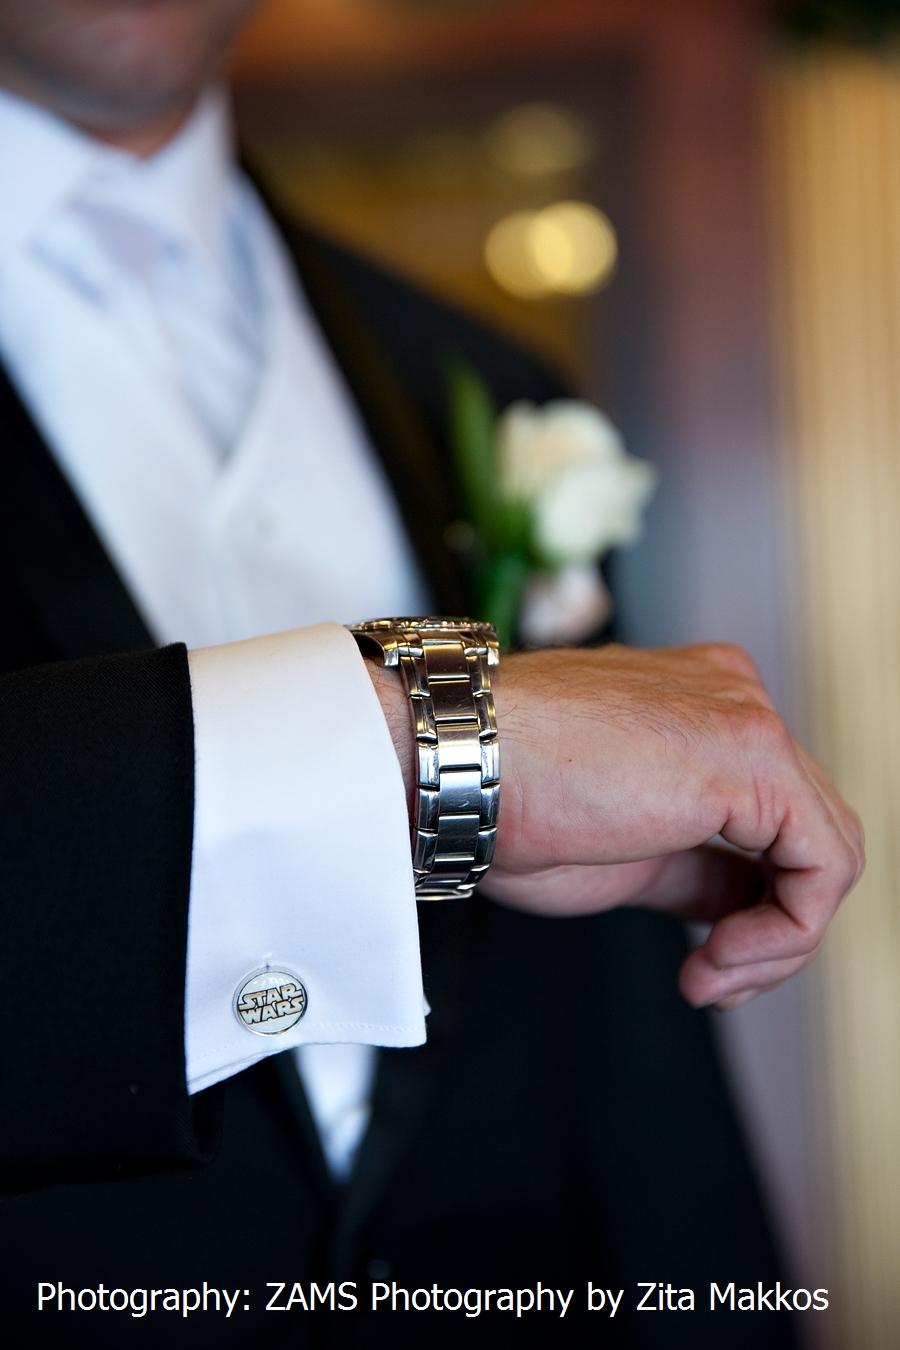 godsmack_sun_band_logo_cuff_links_men_weddings_grooms_groomsmen_gifts_dads_graduations_cufflinks_3.jpg